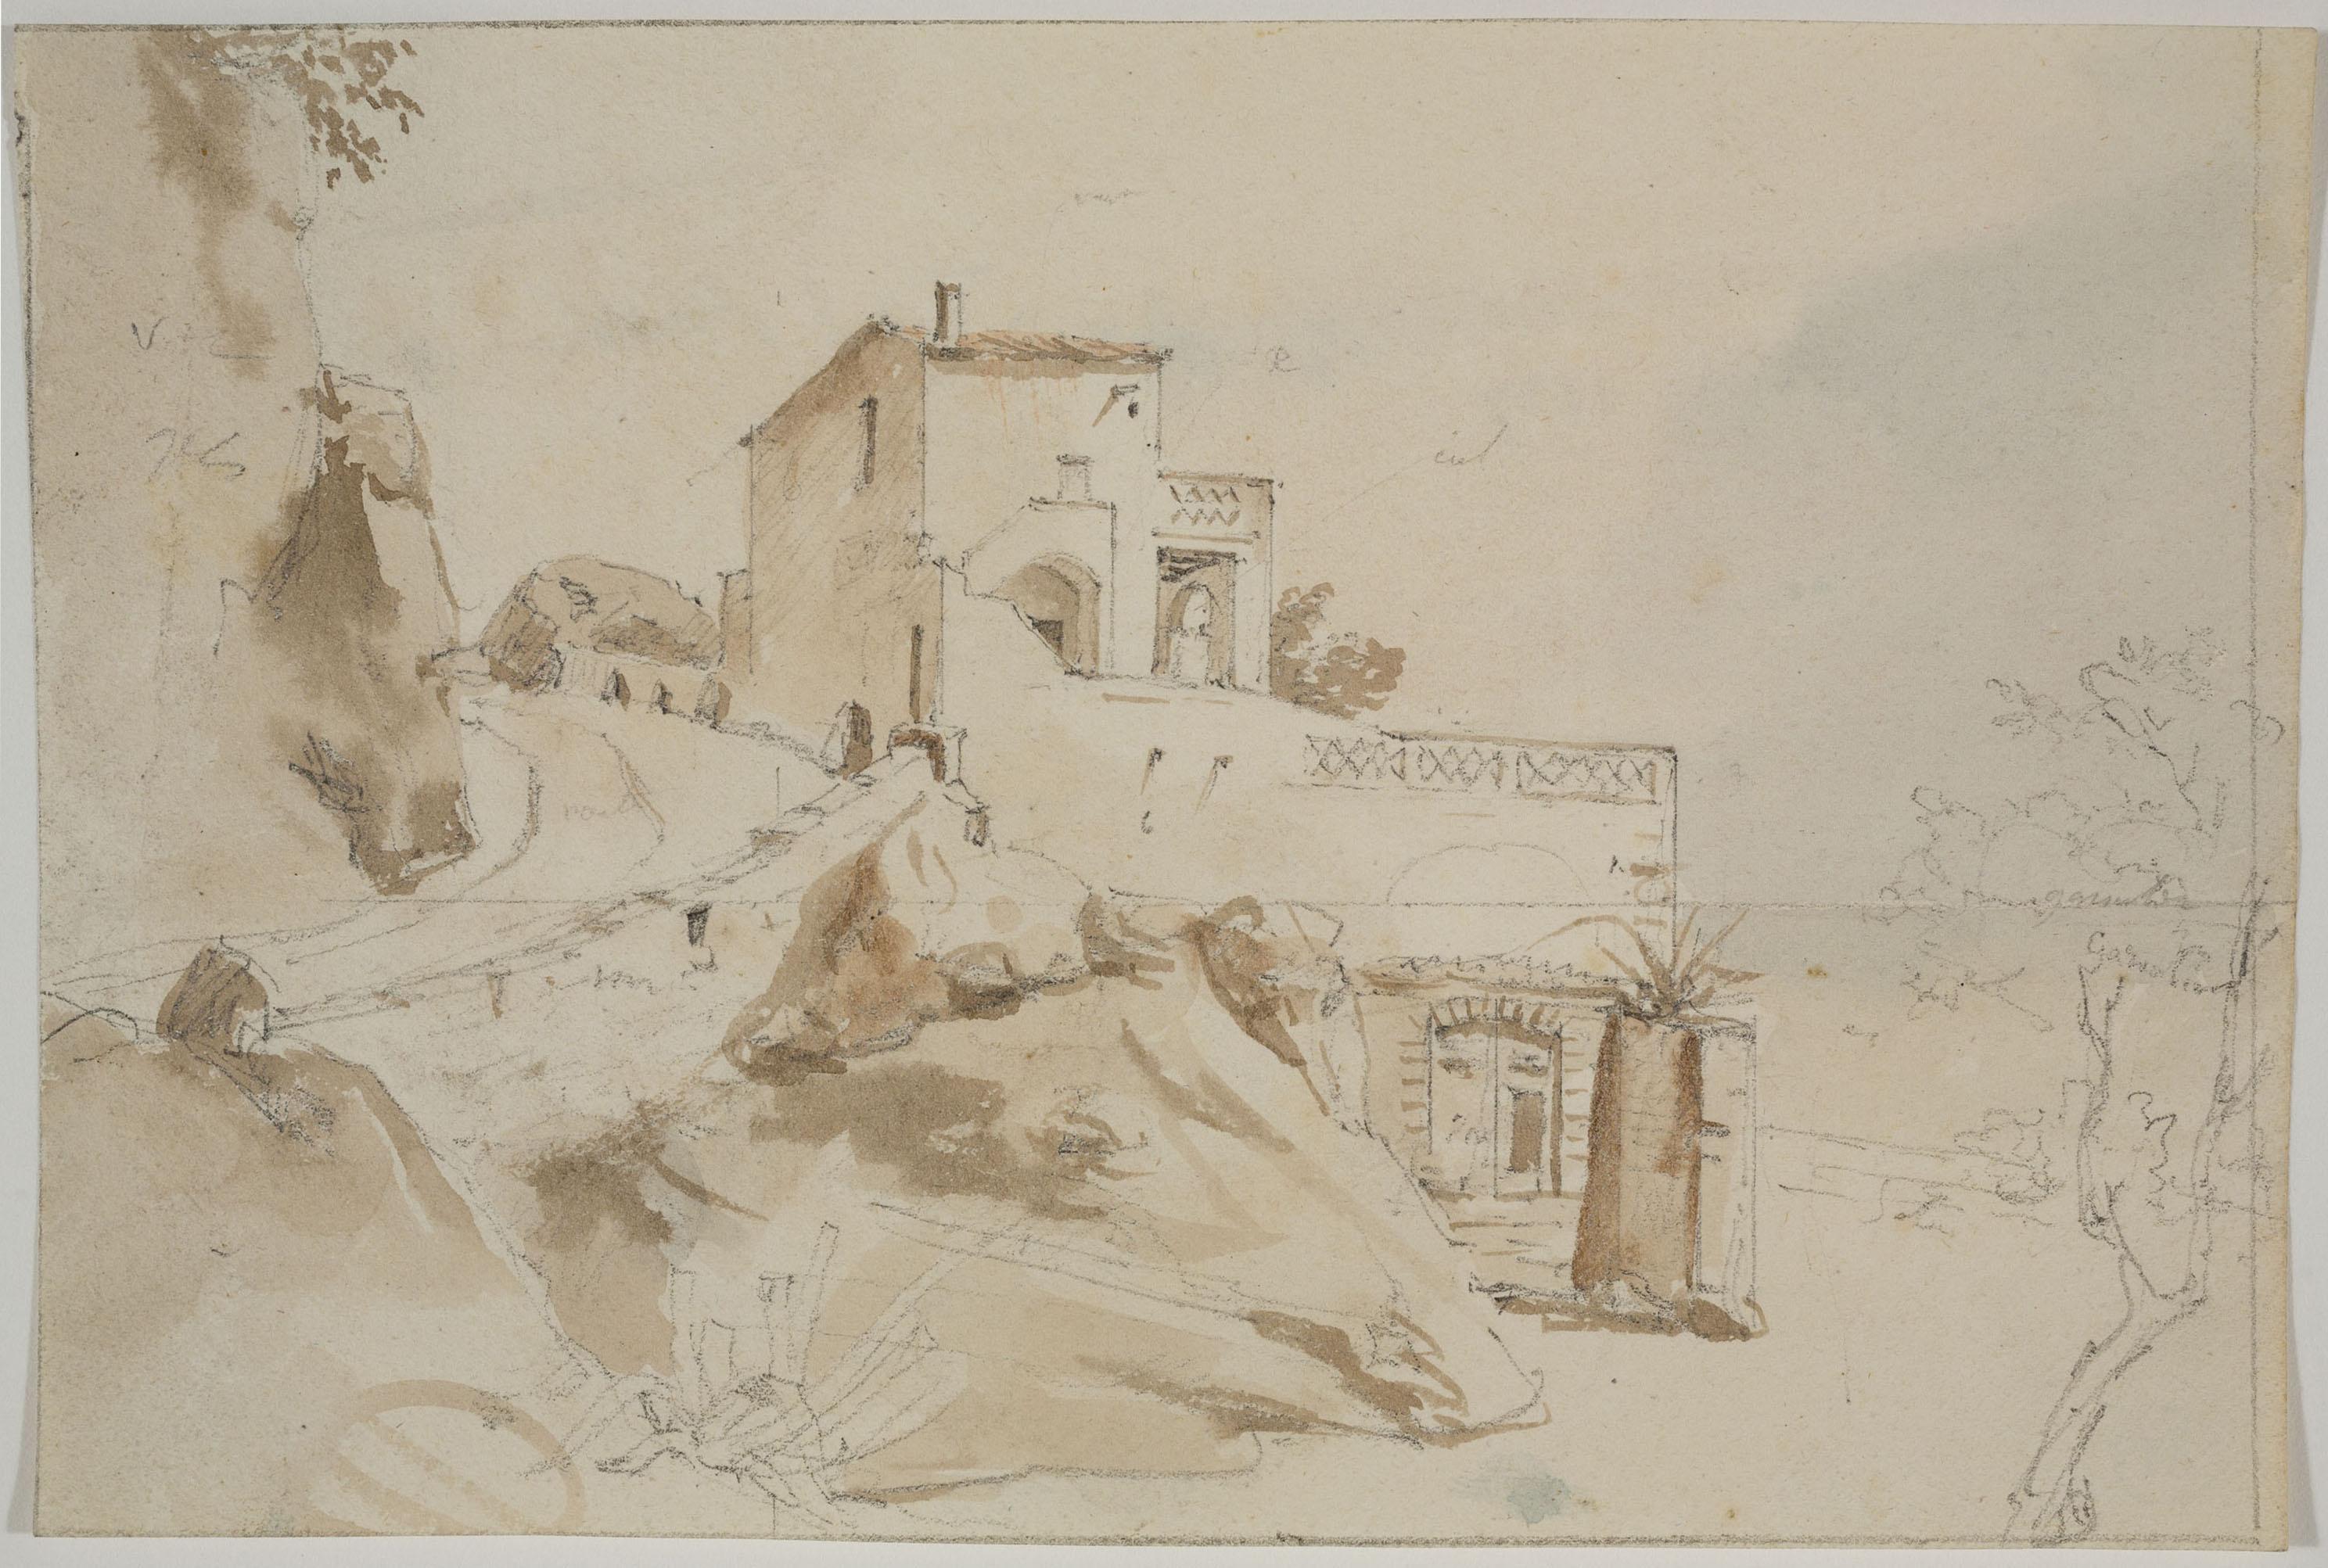 Adolphe Hedwige Alphonse Delamare - Arenys de Mar - November 28, 1826